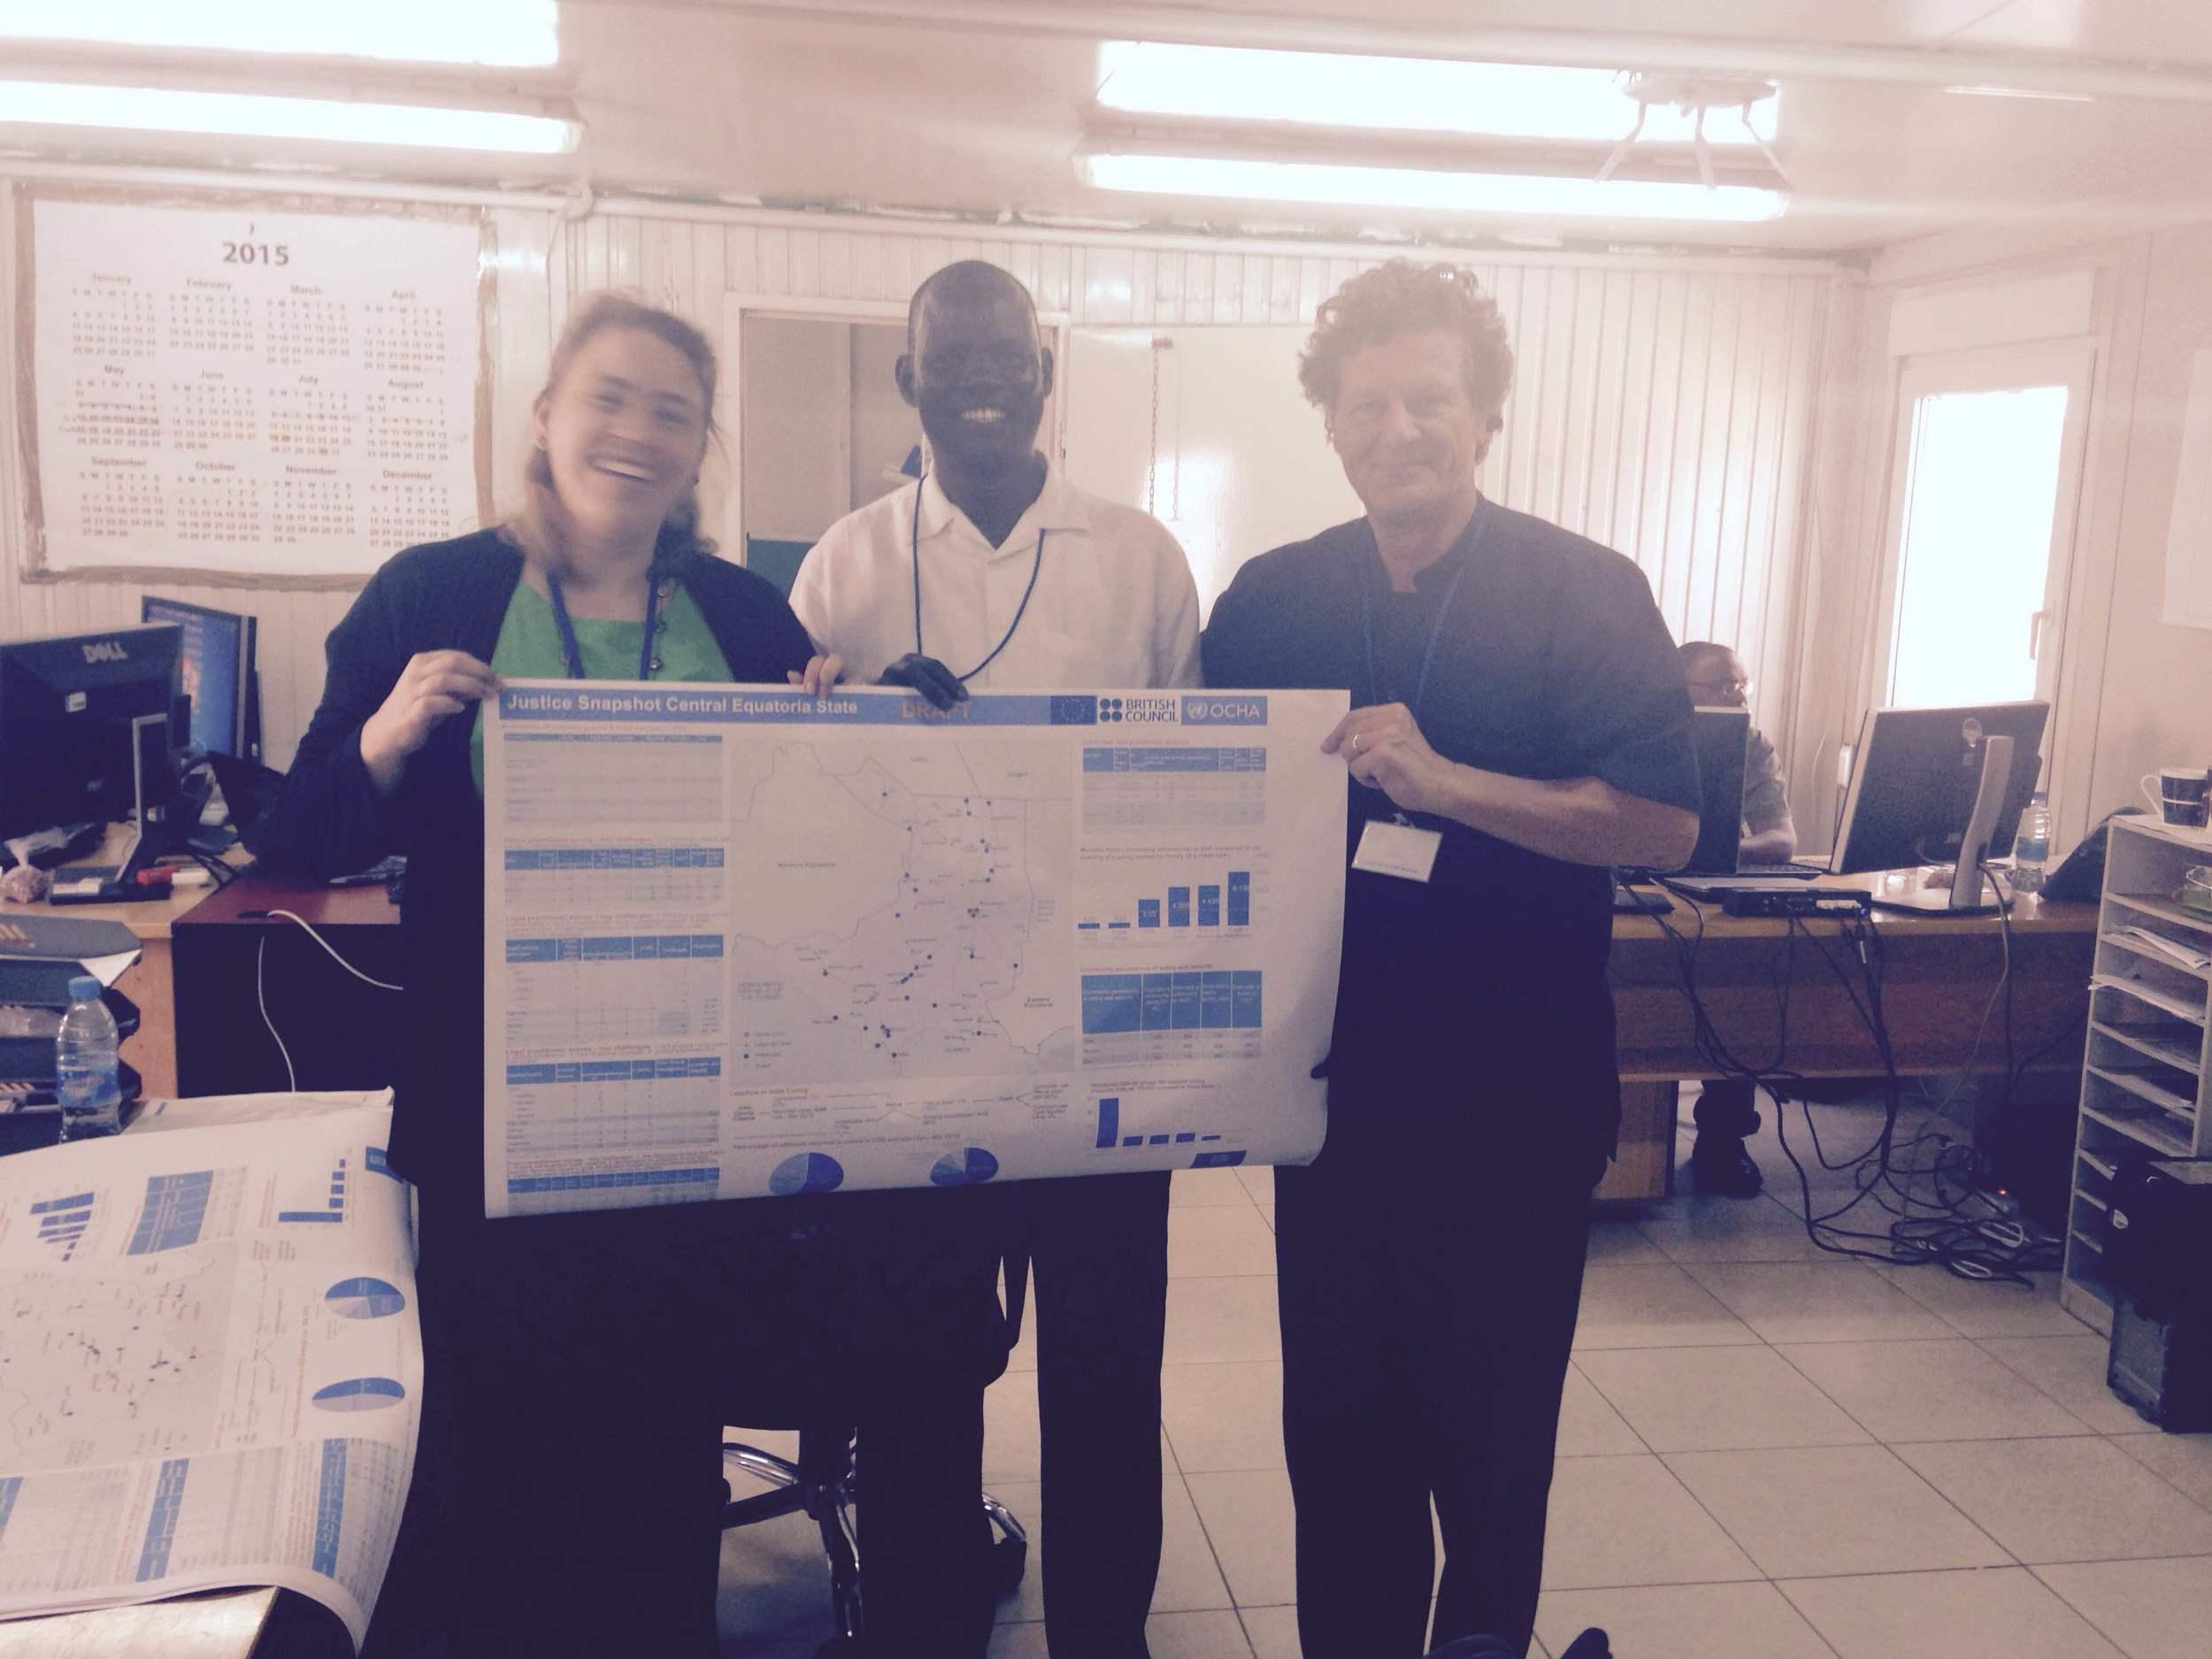 Heather Goldsmith (GJG), Joseph Abeya (UNOCHA) and Adam Stapleton (GJG) - the team that designed the Justice Snapshot of Central Equatoria State, South Sudan